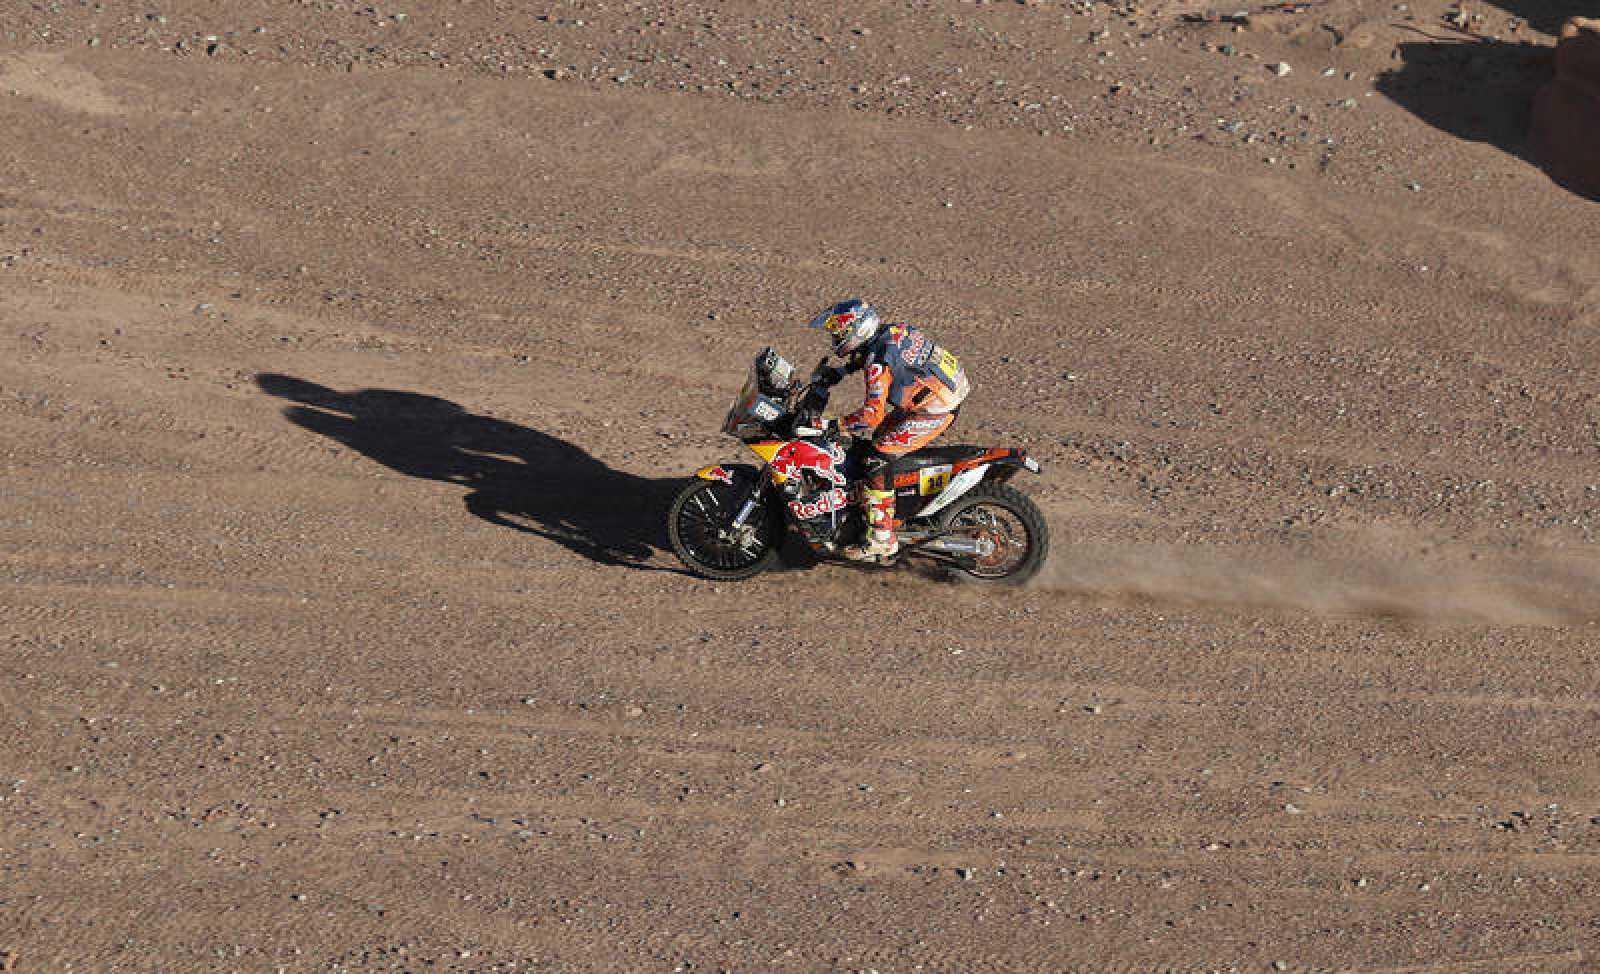 El piloto britanico Sam Sunderland conduce su KTM durante la décima etapa del Dakar.